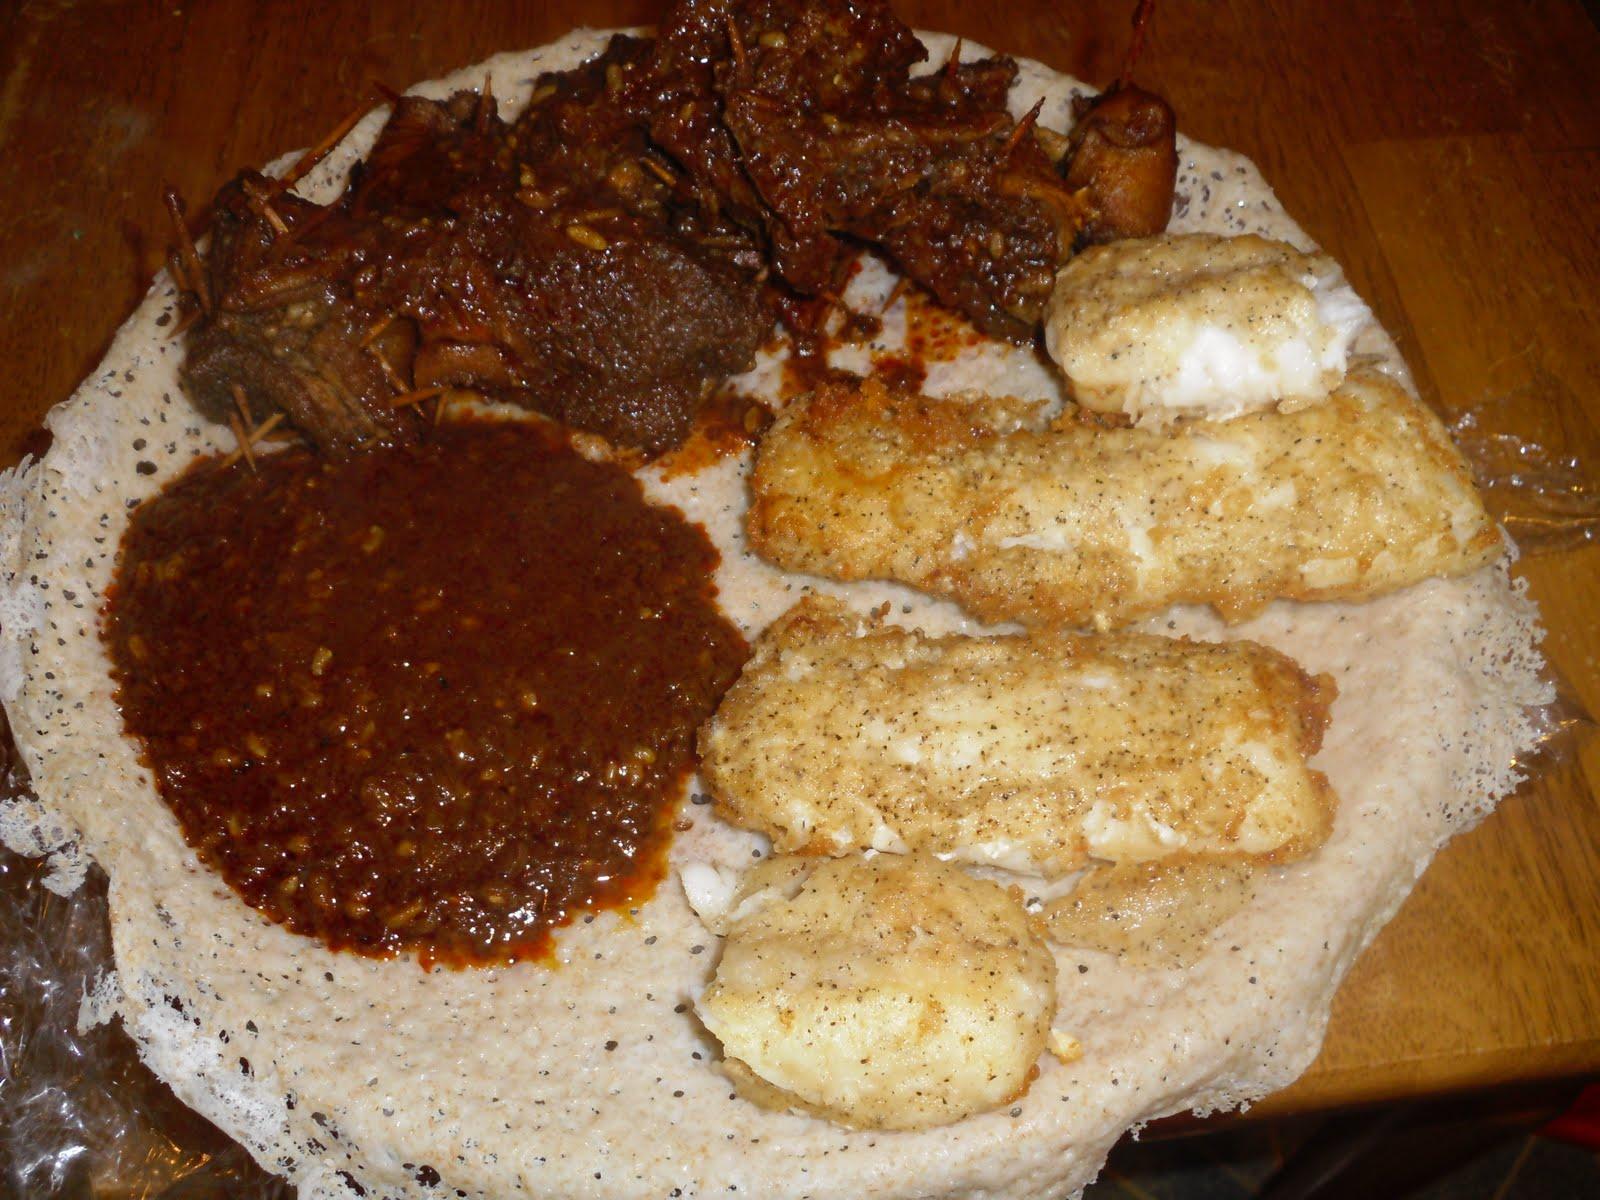 Yeassa tibs fried fish a faranje cooks habesha monday april 12 2010 forumfinder Image collections